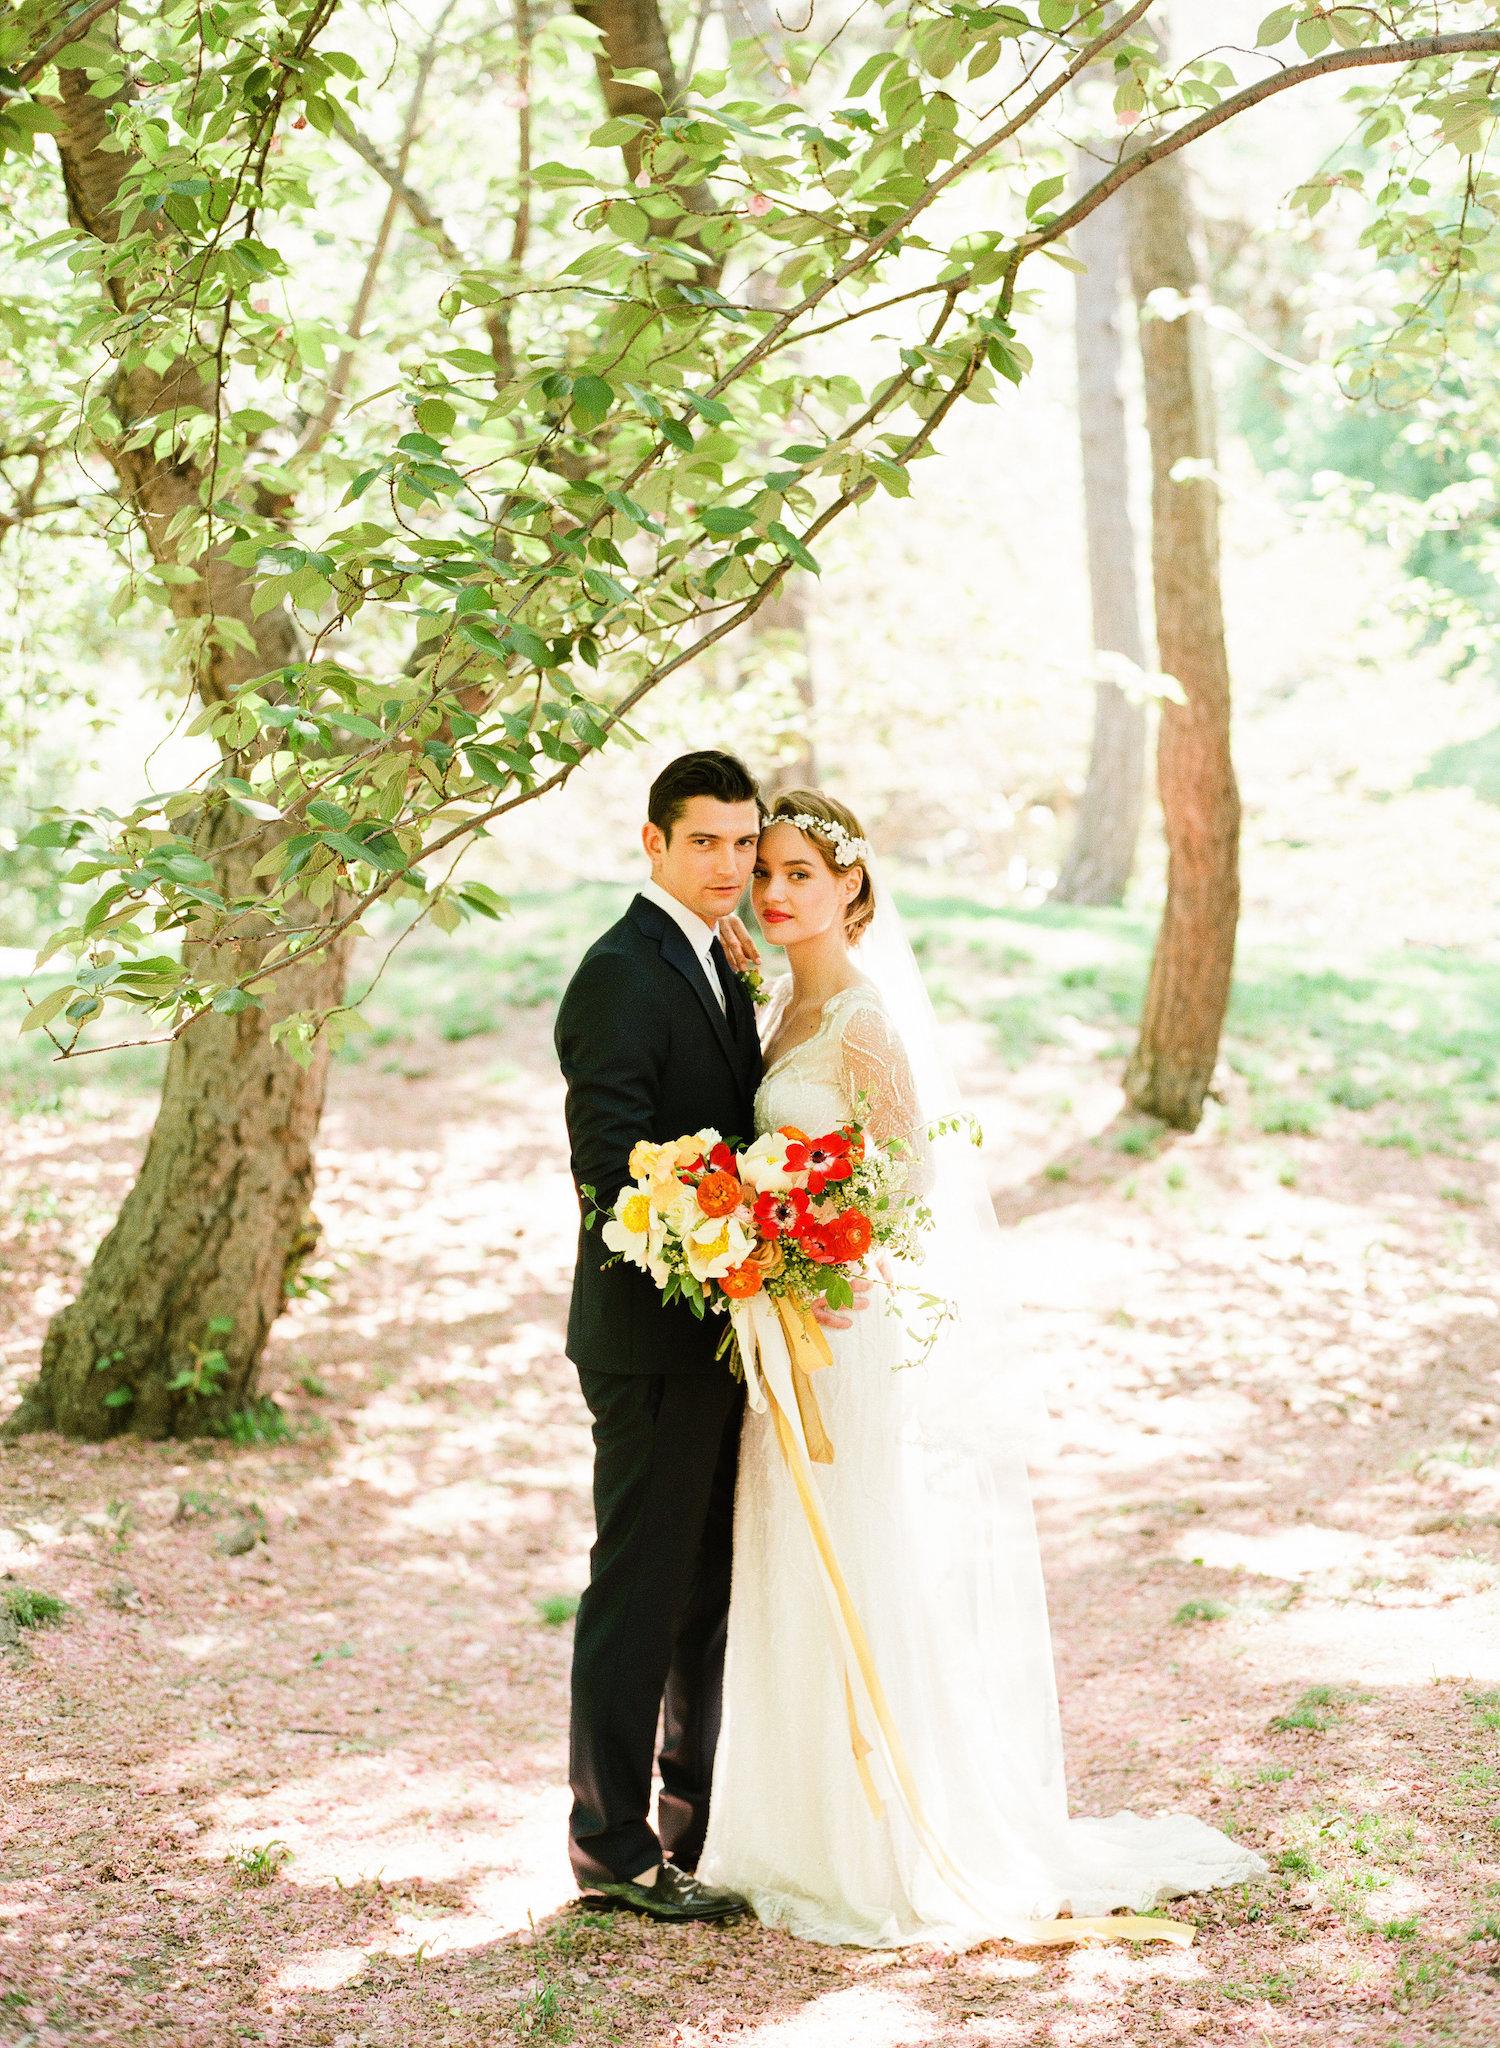 Morning Glow - Full Aperture Floral & Lindsay Madden Photography 21.jpeg